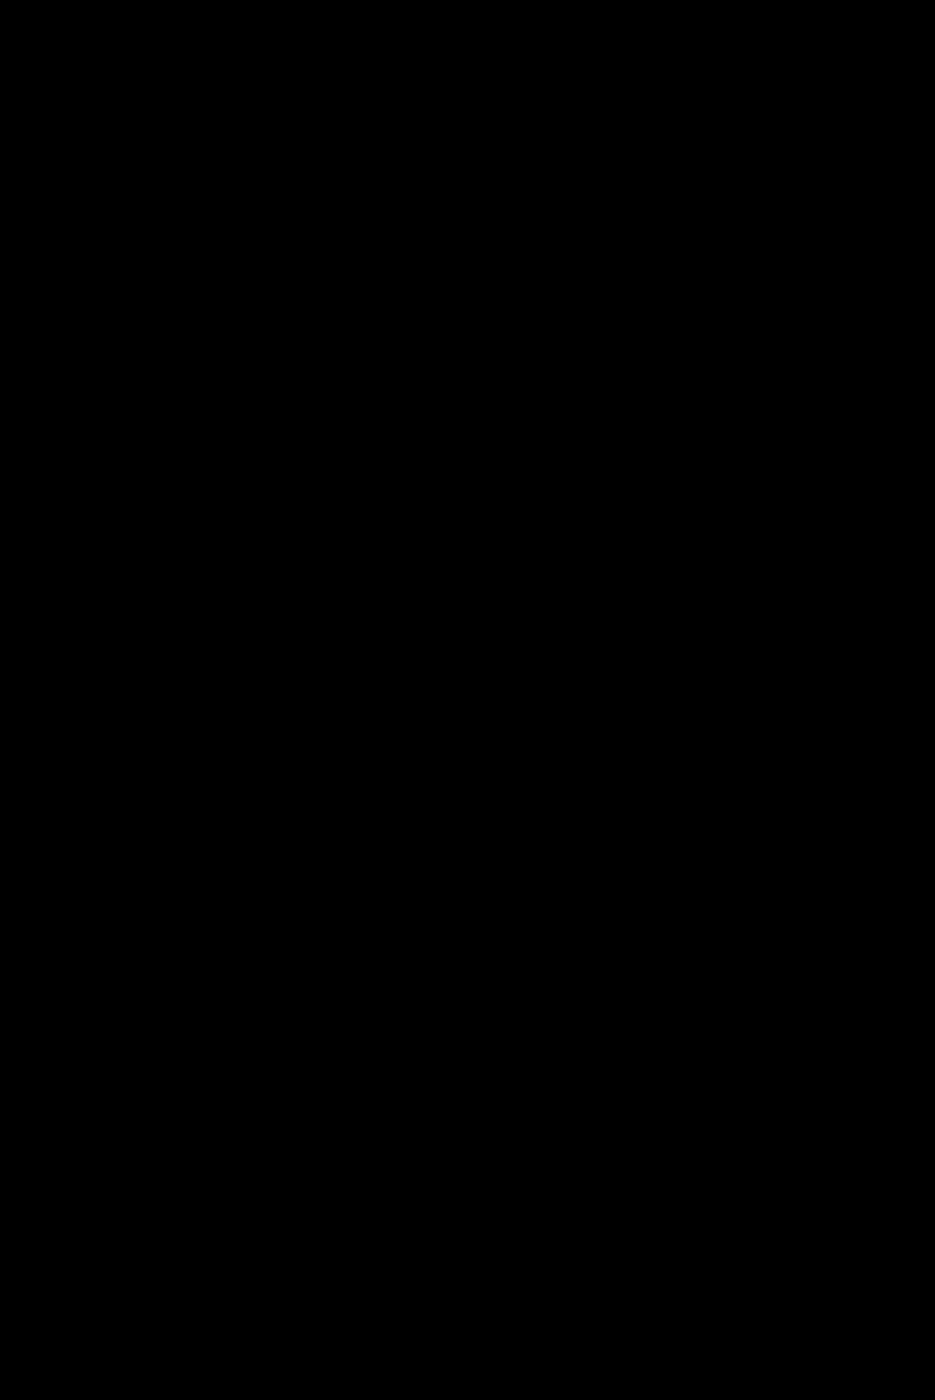 Palton Burgundy cu maneci din imitație